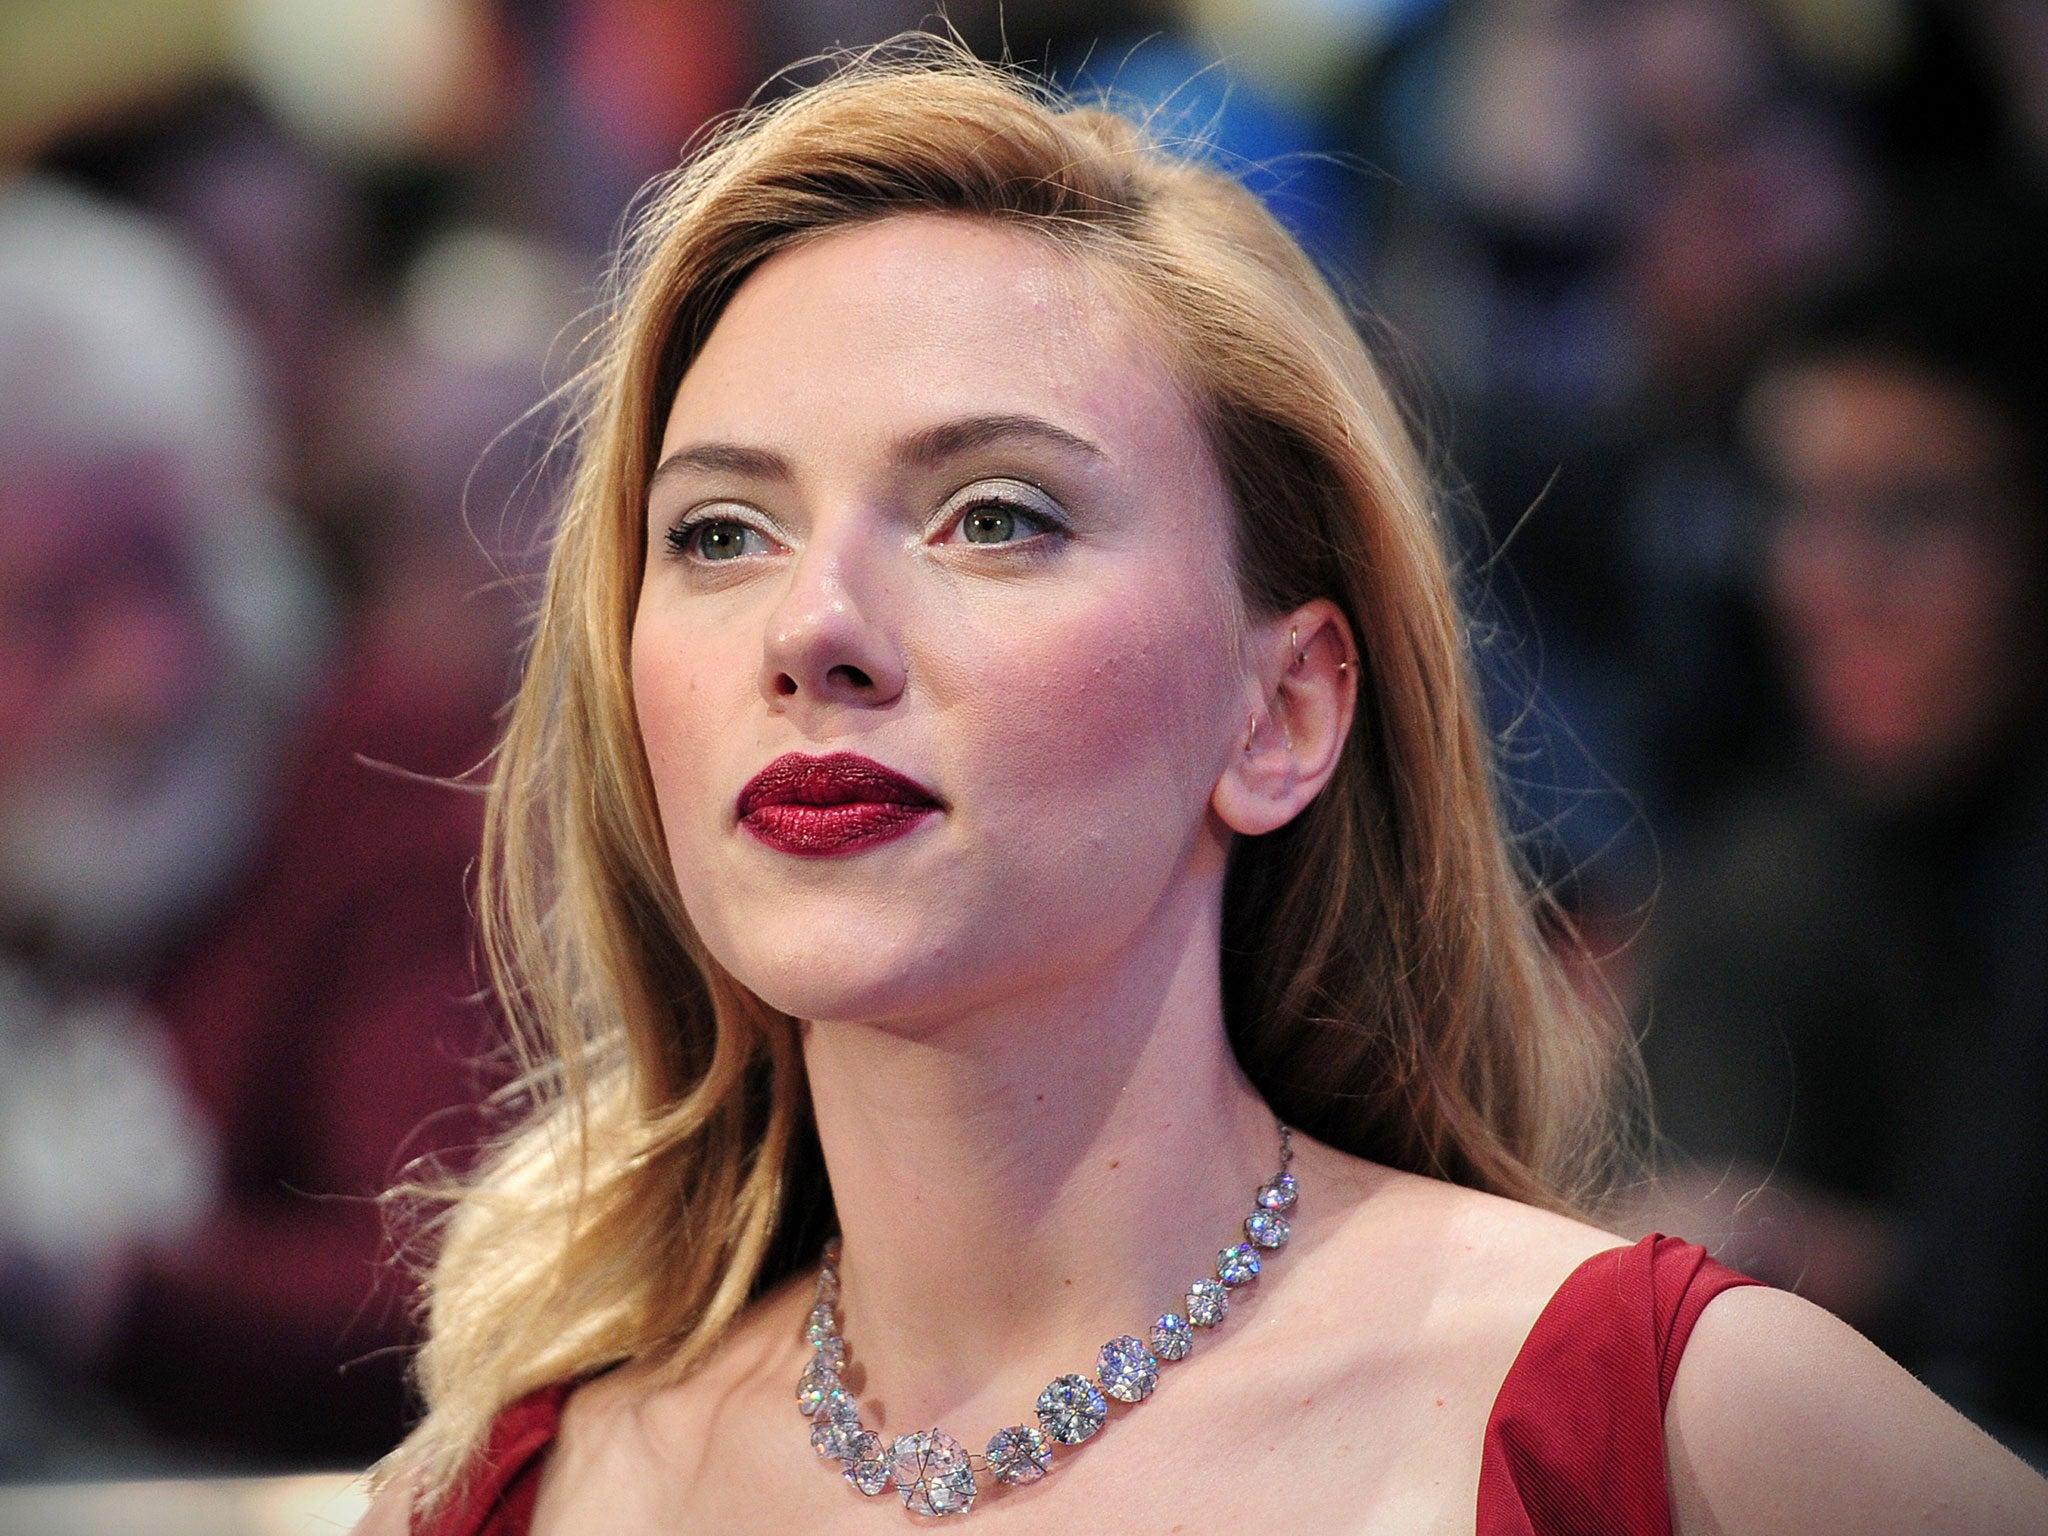 Scarlett johansson in extras from the avengers - 1 part 4